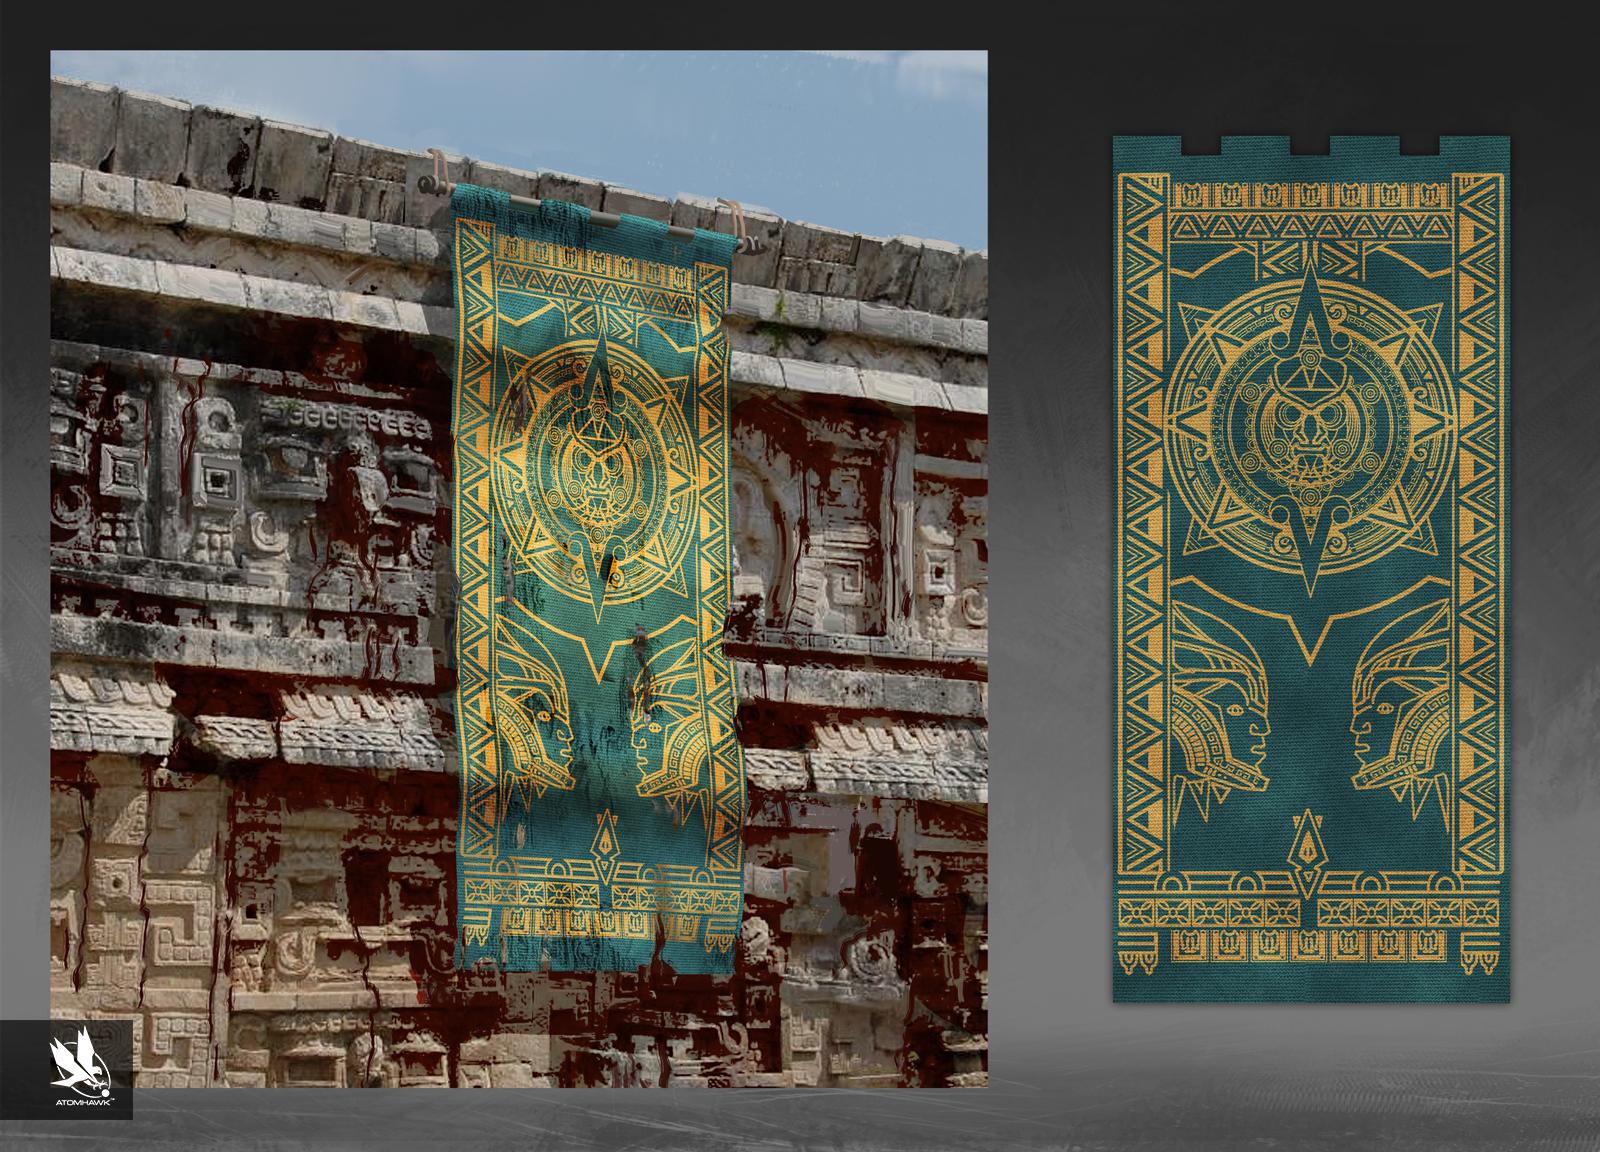 Atomhawk_Warner-Bros-NetherRealm_Mortal-Kombat-11_Concept-Art_Prop-Design_Kotal's_Arena_Breakout_B.jpg